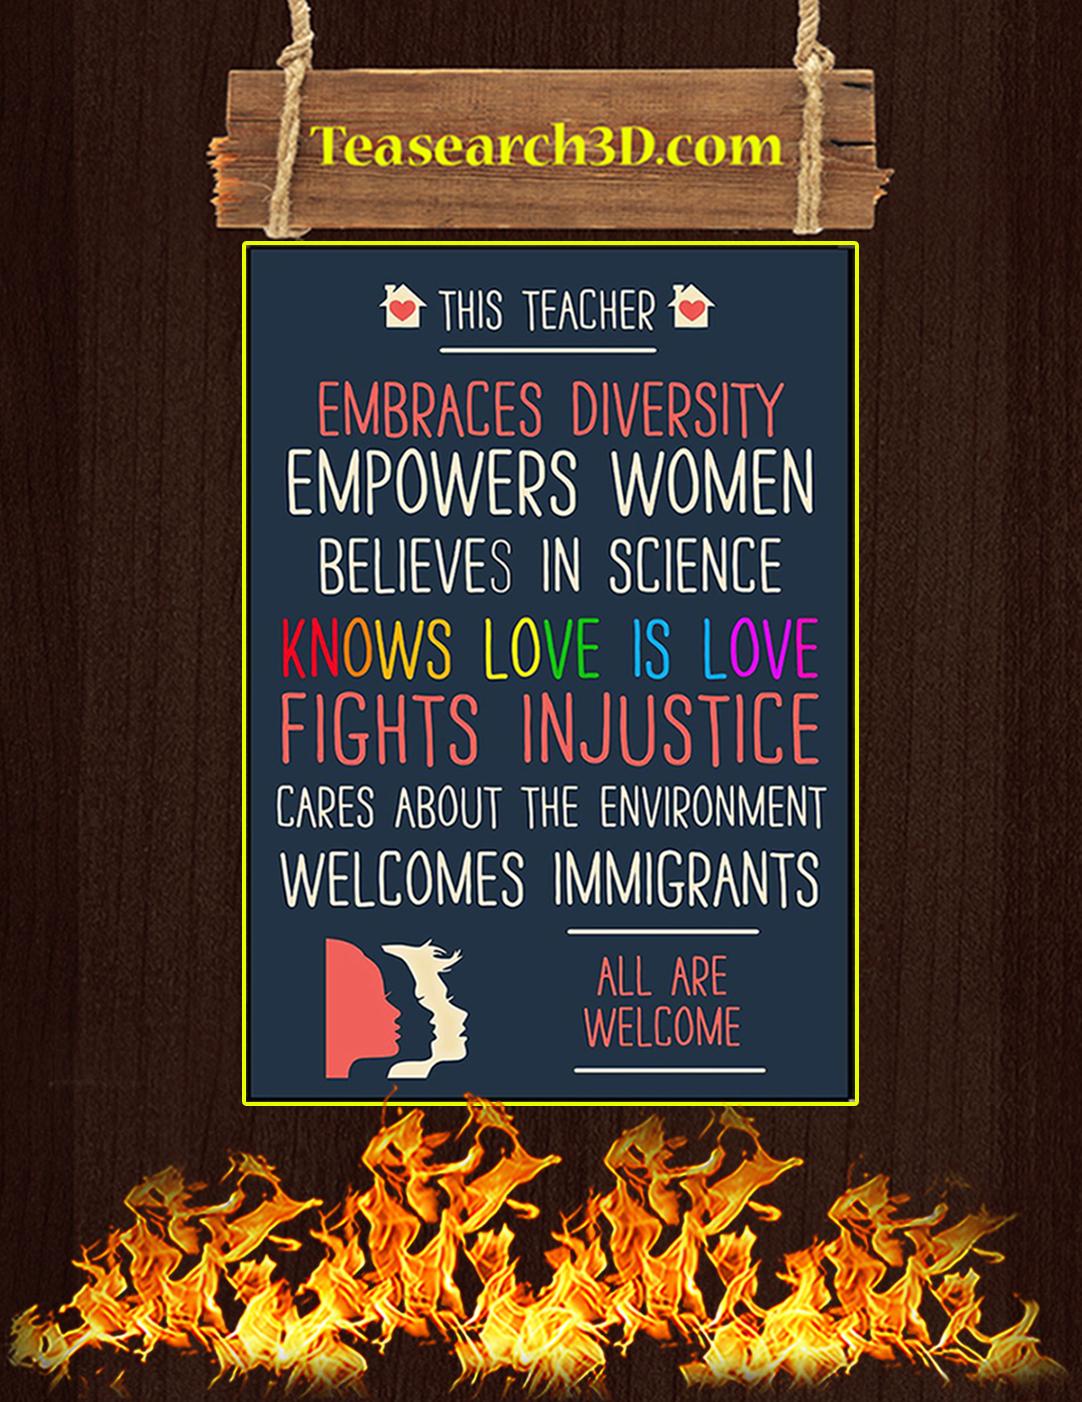 This teacher embraces diversity empowers women poster A2